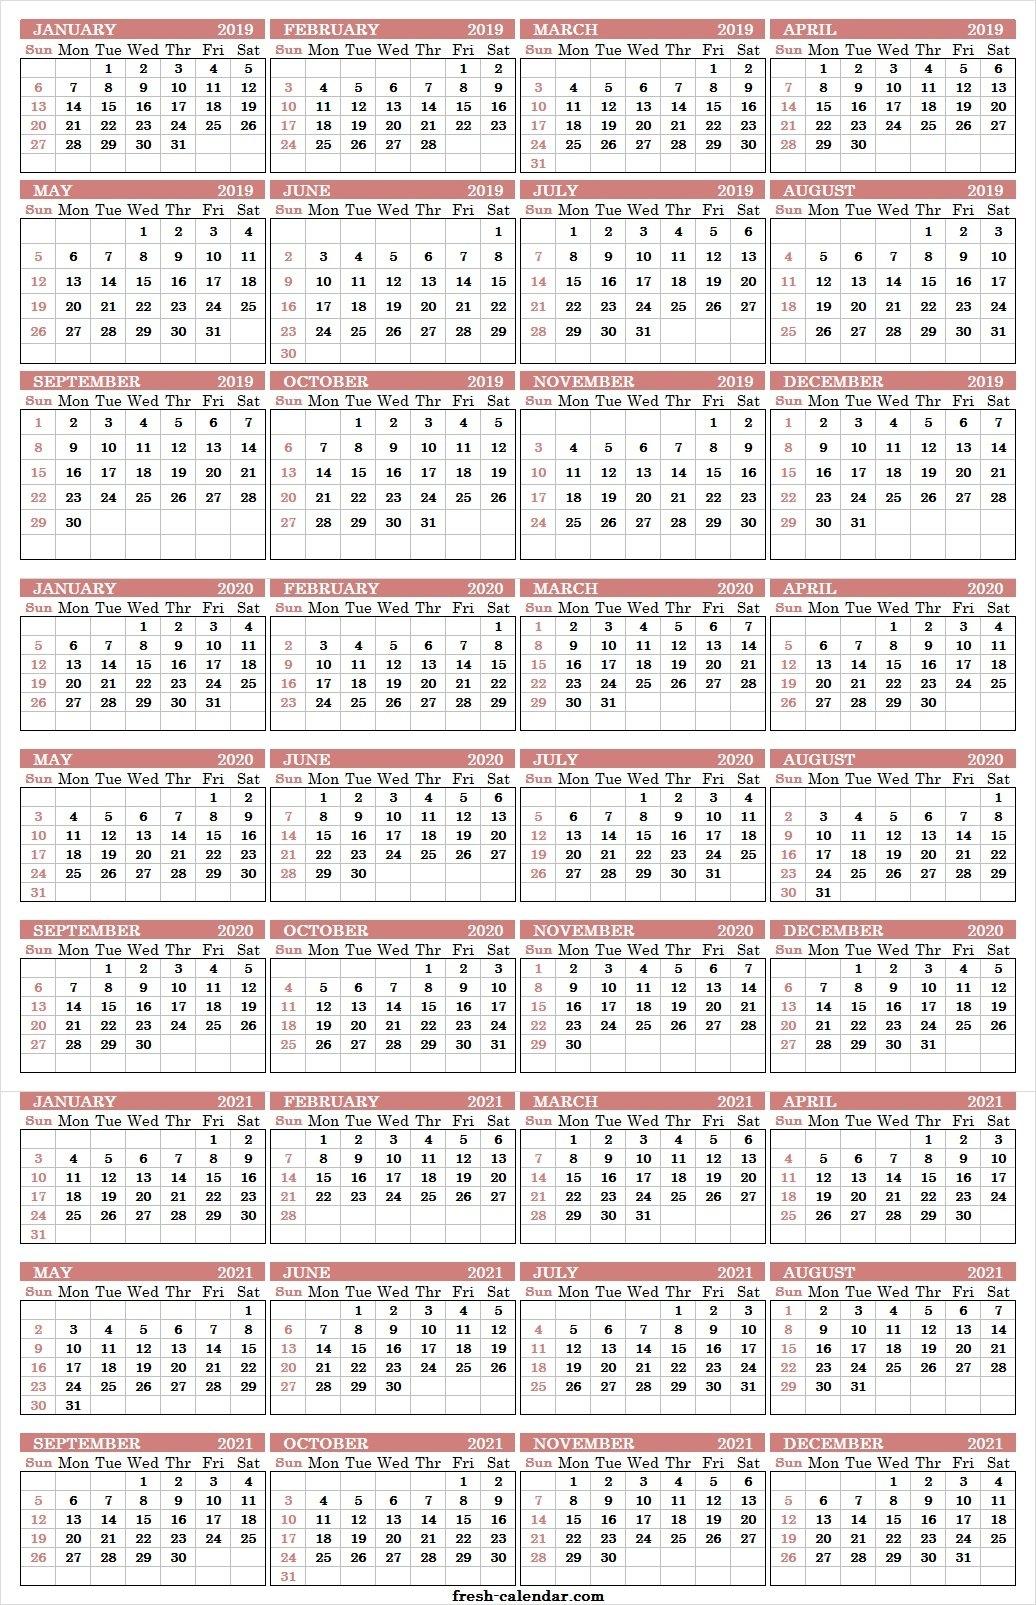 Three Yearly Calendar 2019 2020 2021 Printable Free   Blank Template 3 Year Calendar 2019 To 2021 Printable